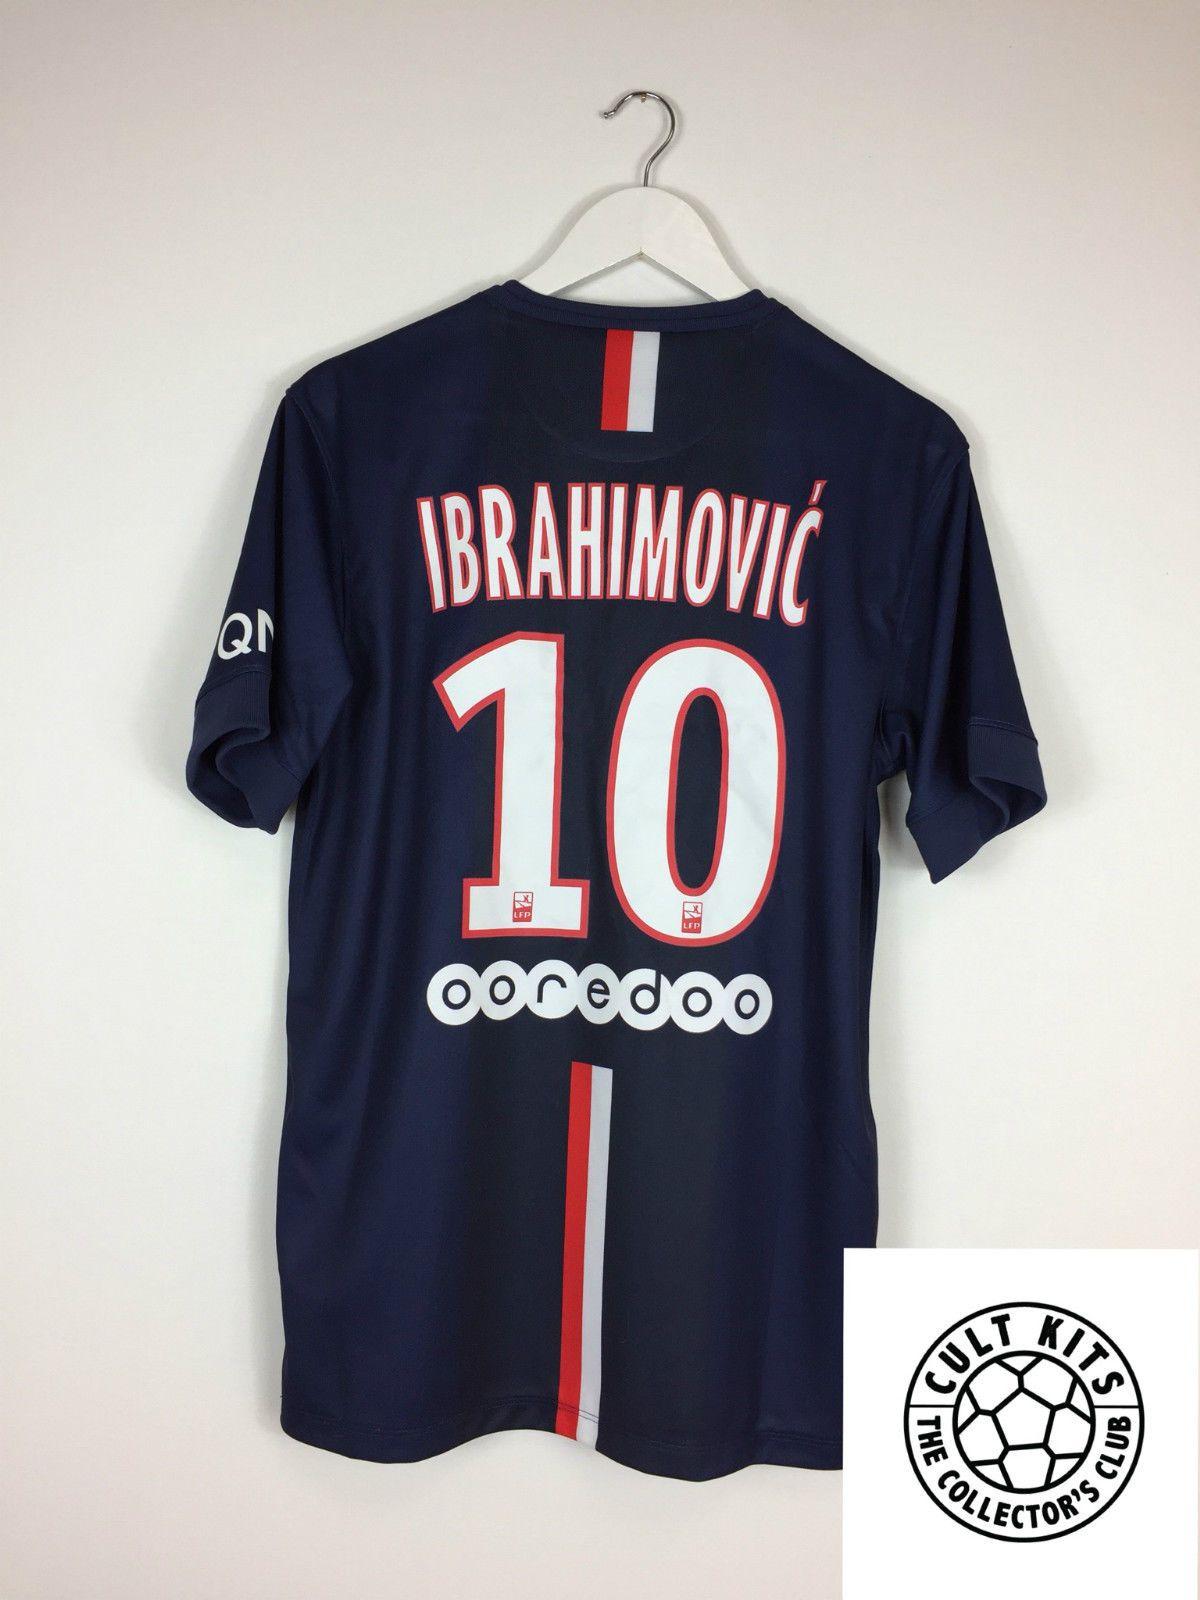 the best attitude 1acd8 b876c PSG IBRAHIMOVIC #10 14/15 Home Football Shirt (M) Soccer ...